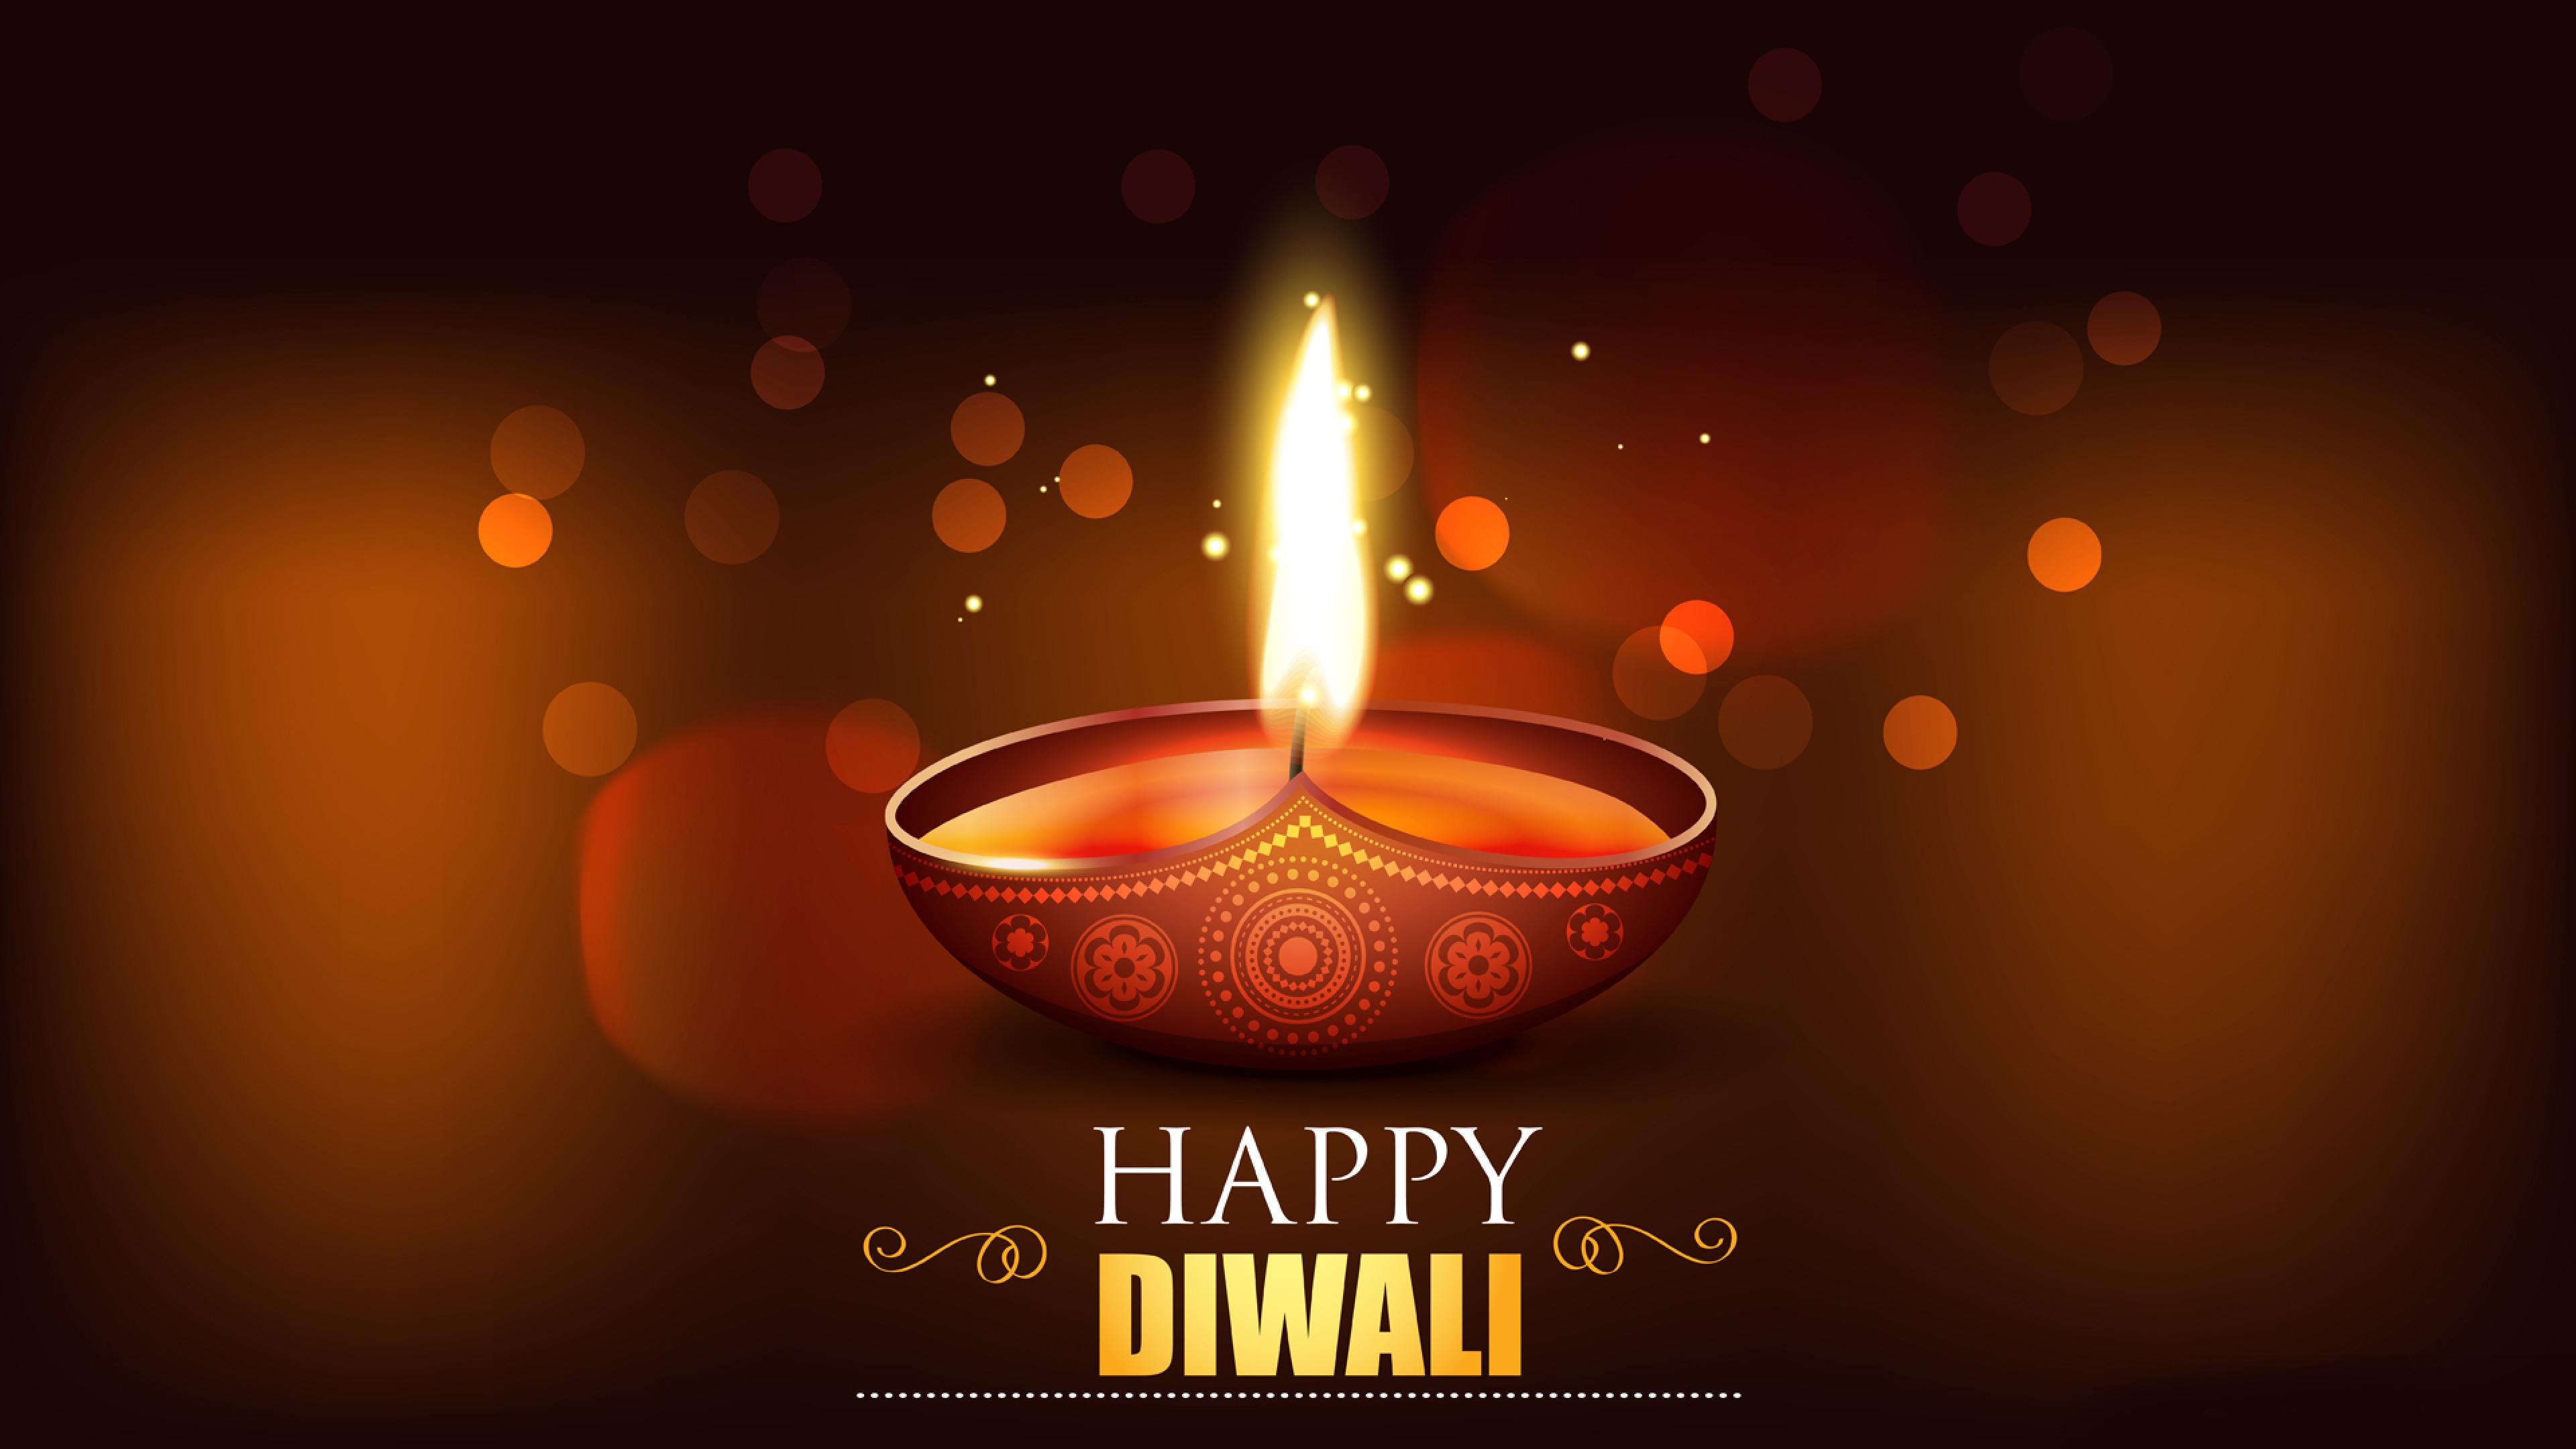 Happy Diwali 2020 Wallpaper in 3840x2160 Resolution